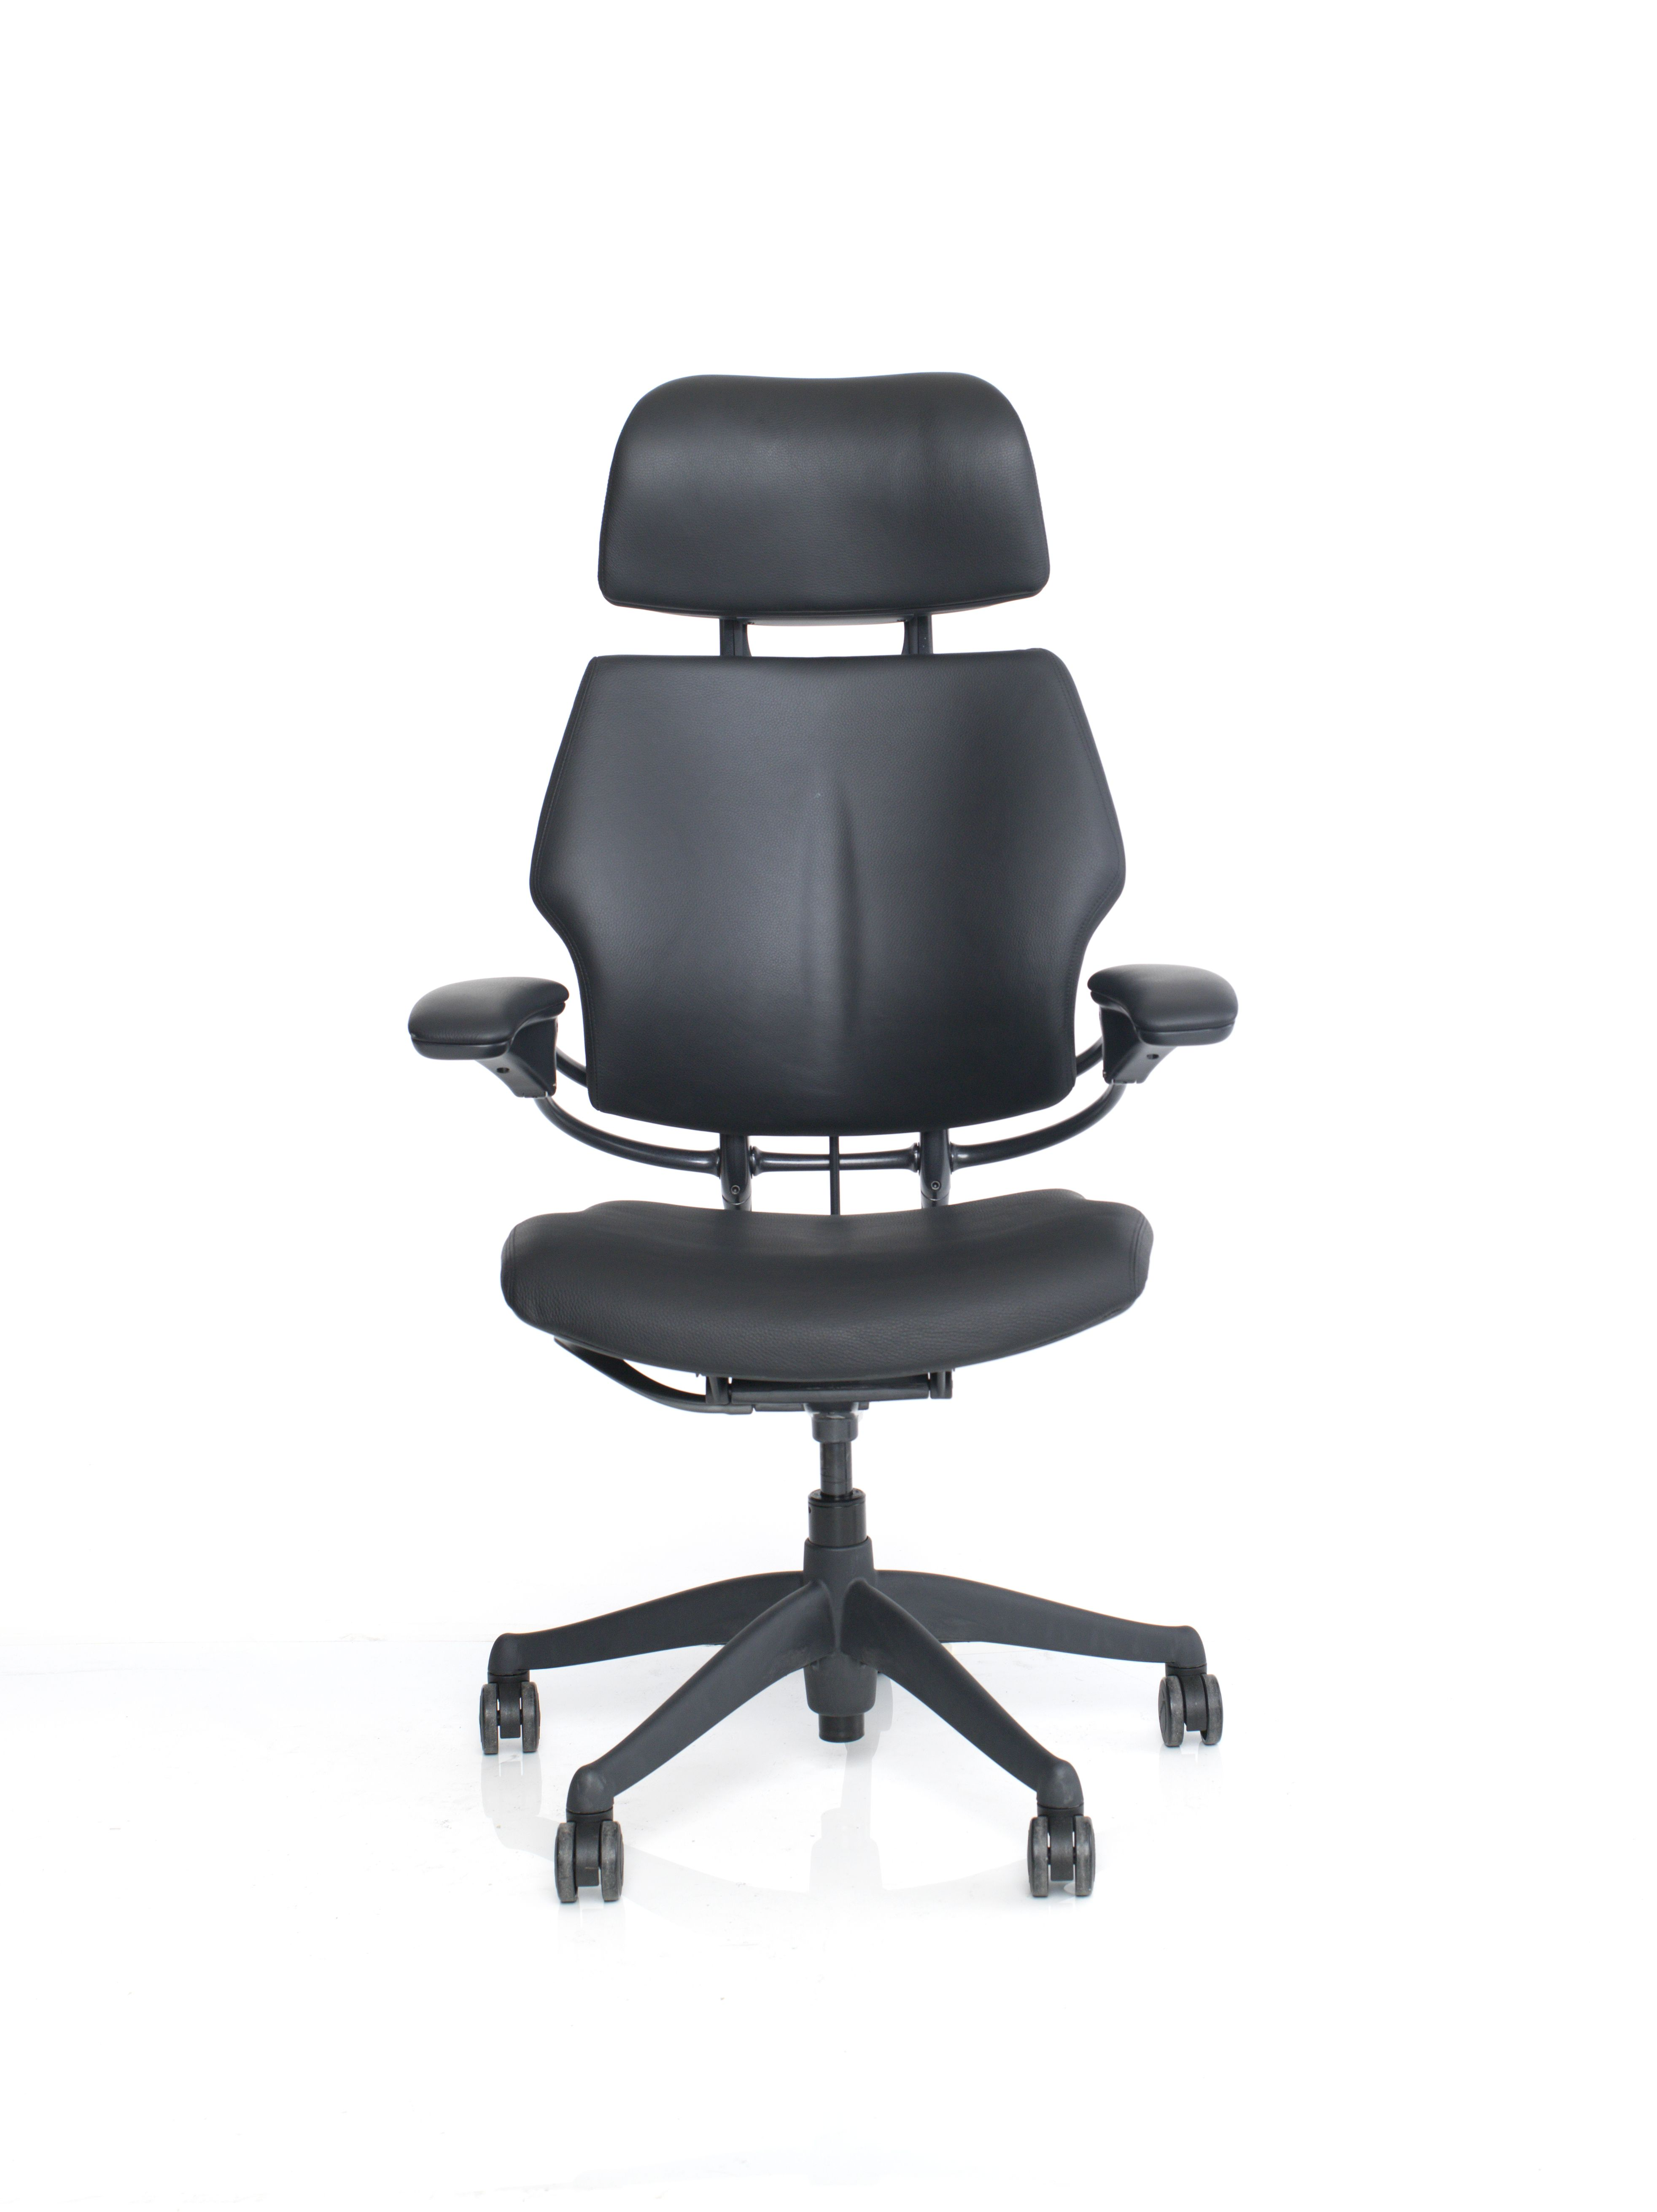 Freedom Headrest Humanscale Niels Diffrient Black Office Chair Modern Furniture Fabrics Study Modern Office Chair Used Office Chairs Chair